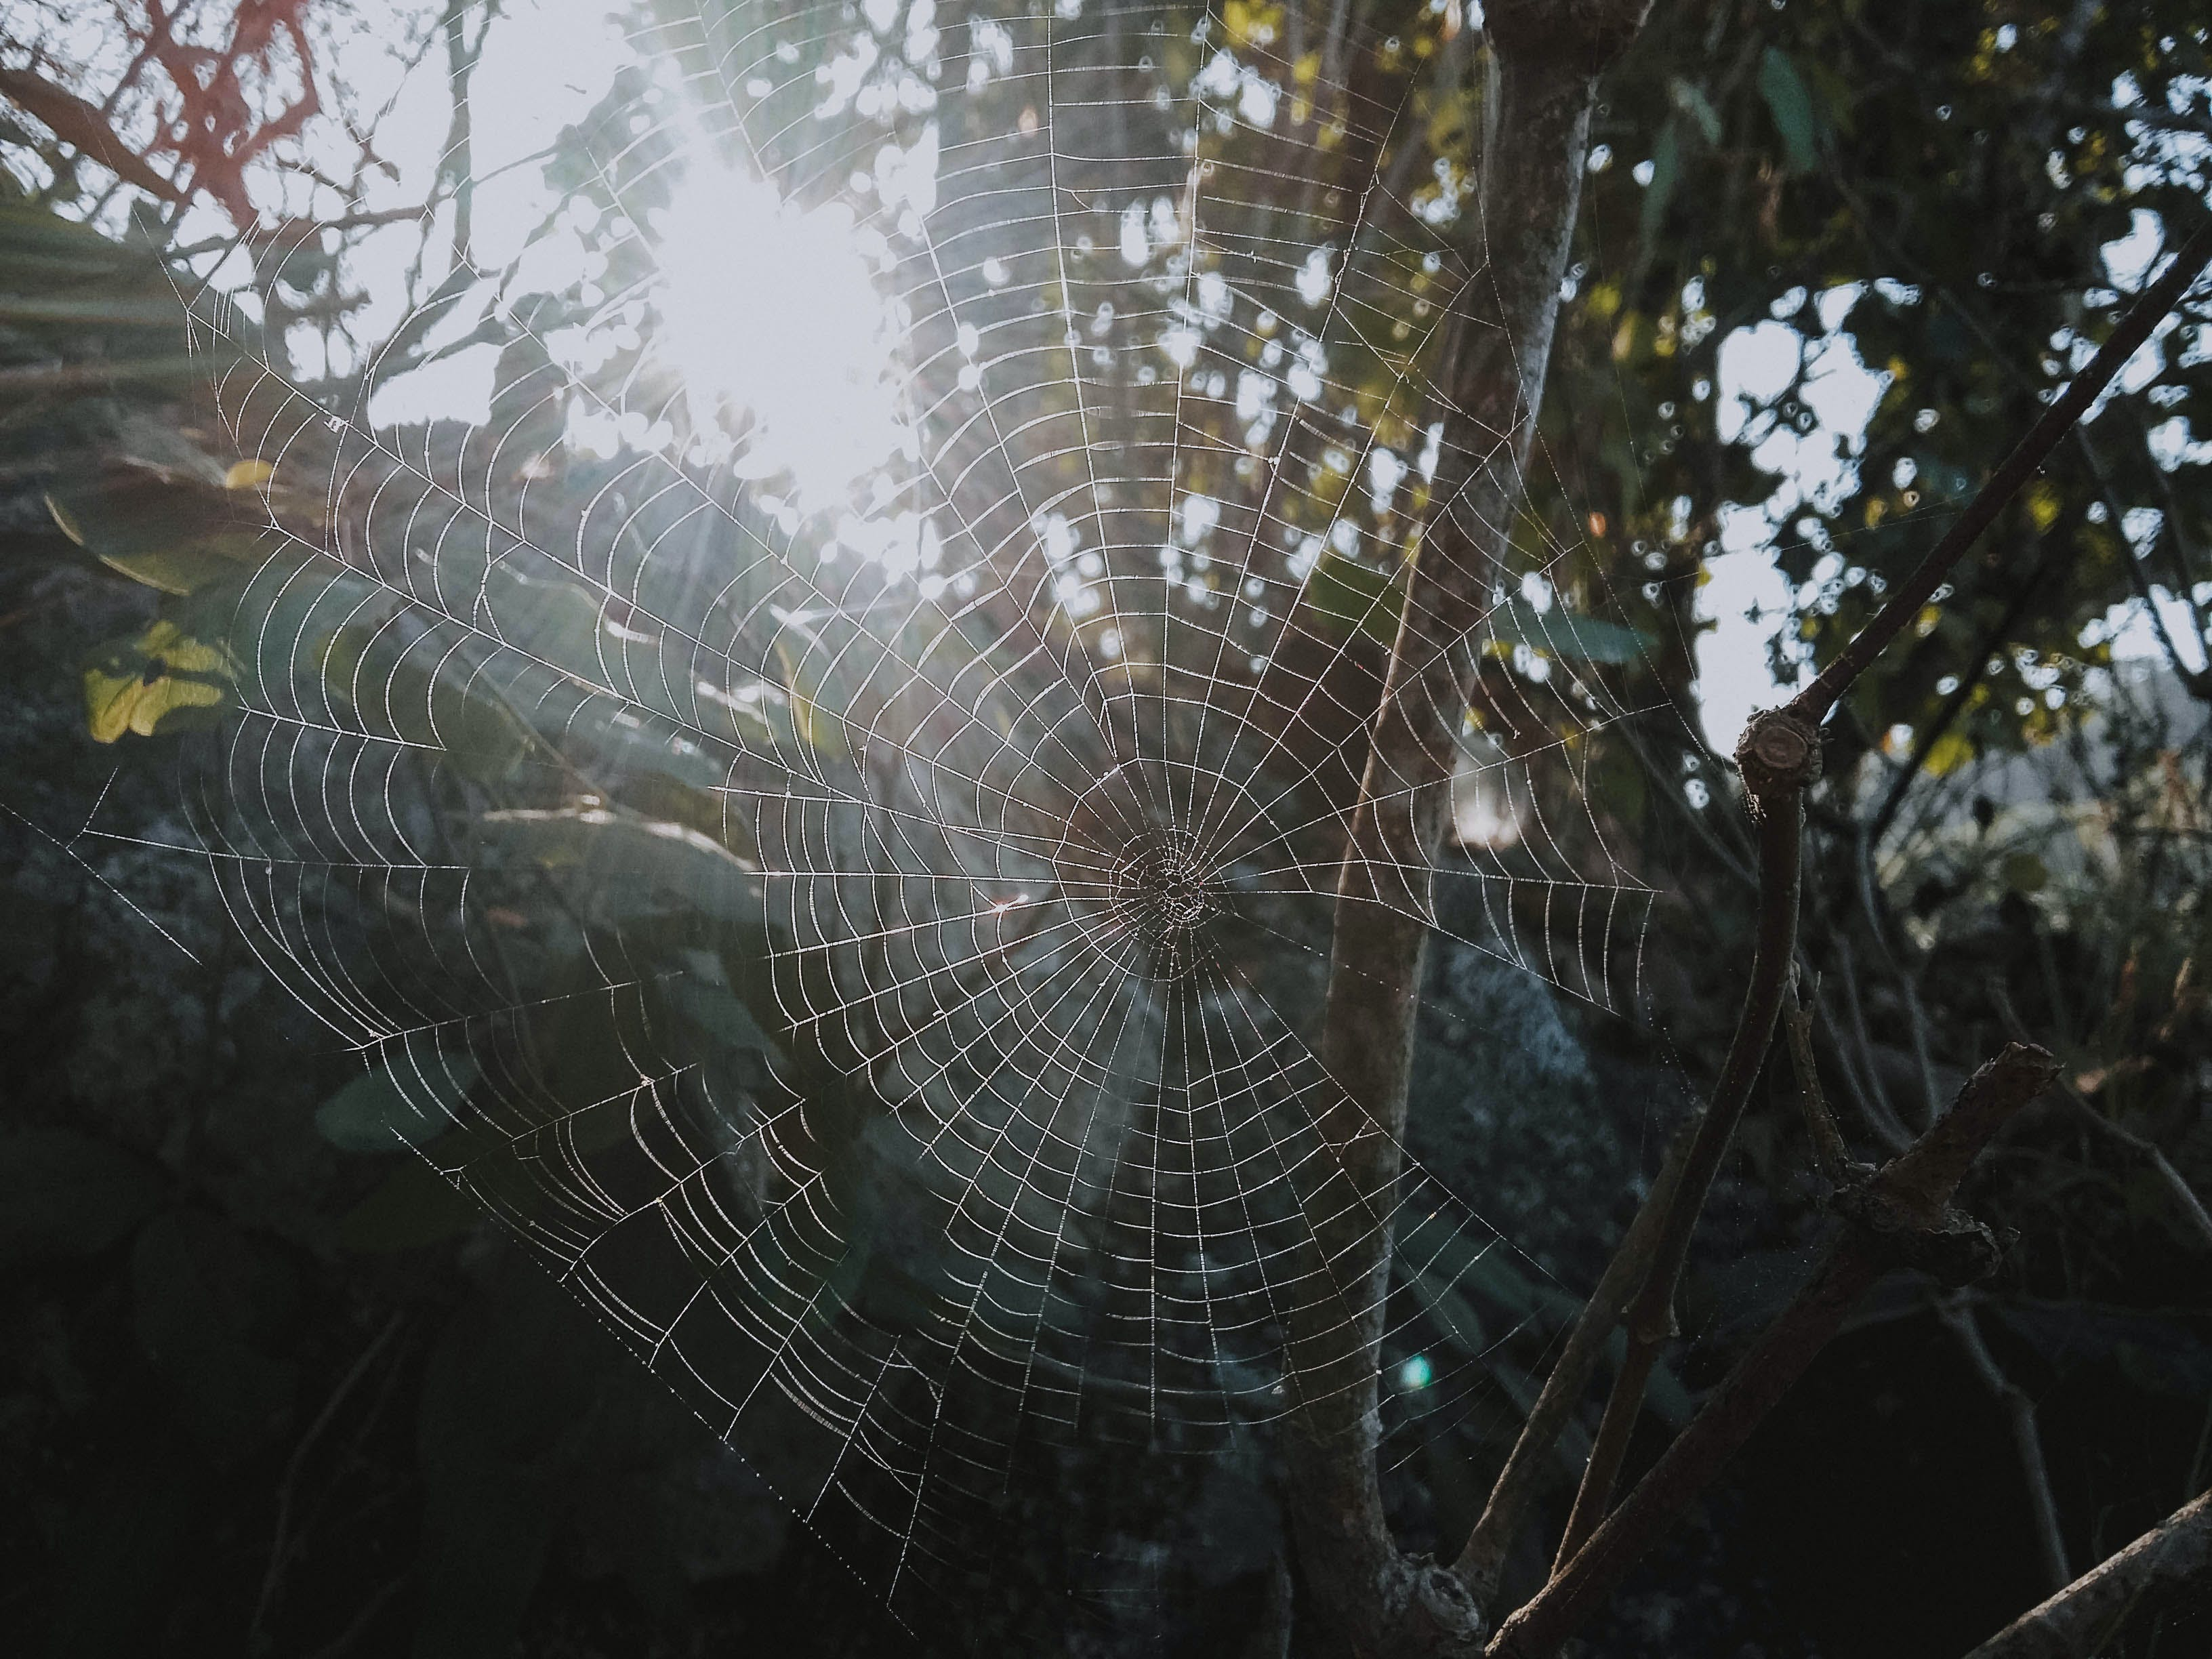 Cobweb On Tree Branch